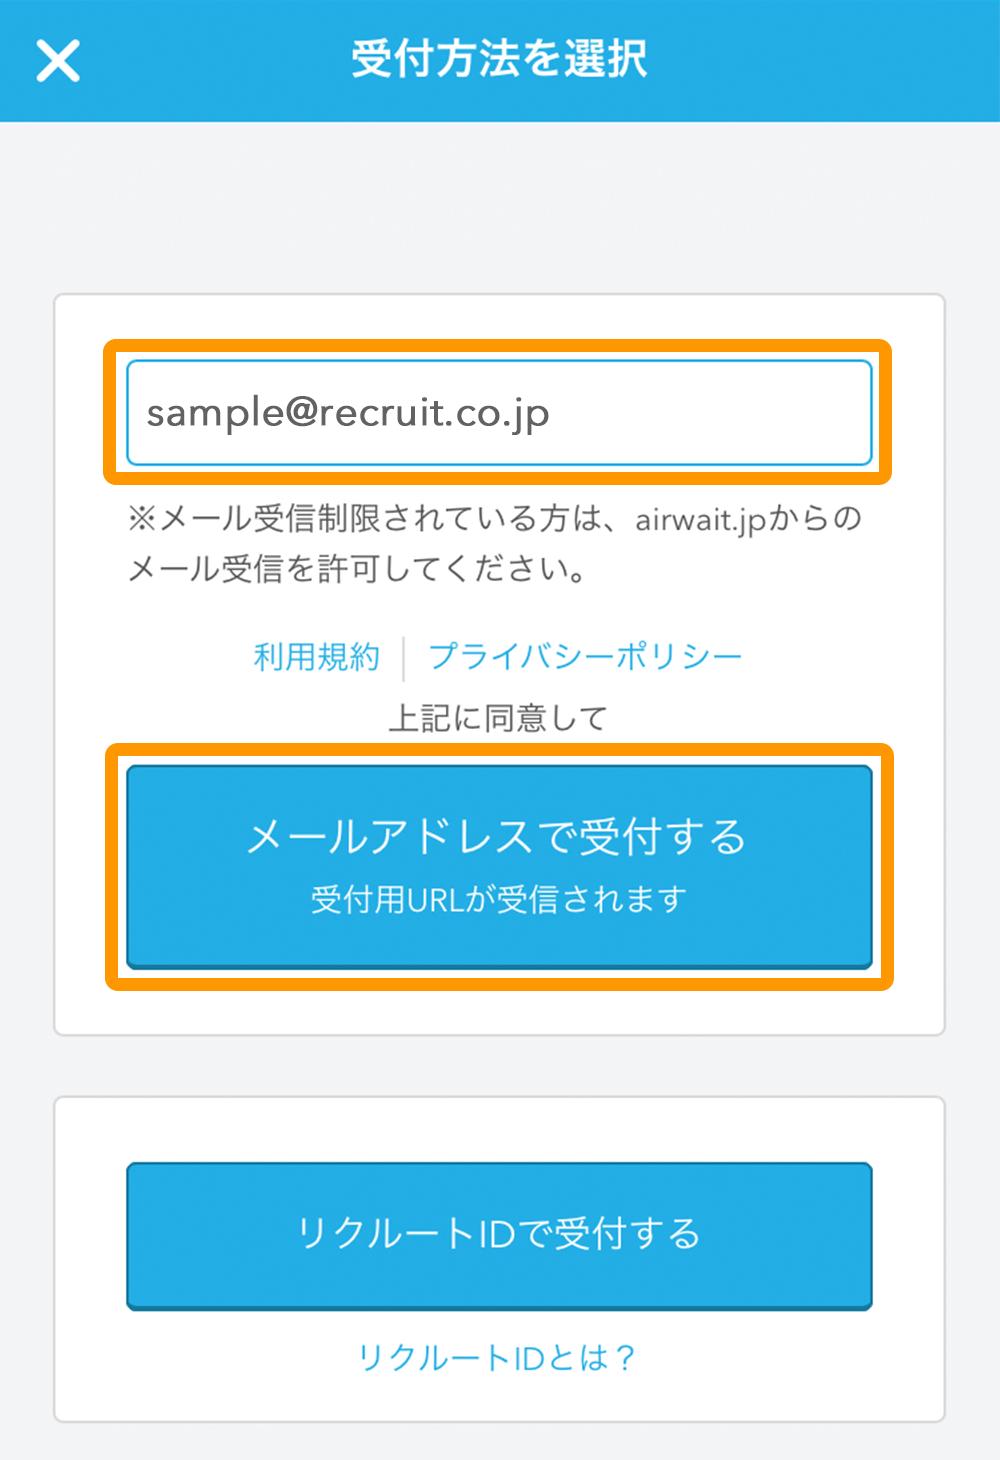 Airウェイト カスタマー 順番待ち受付画面 メールアドレスで受付する